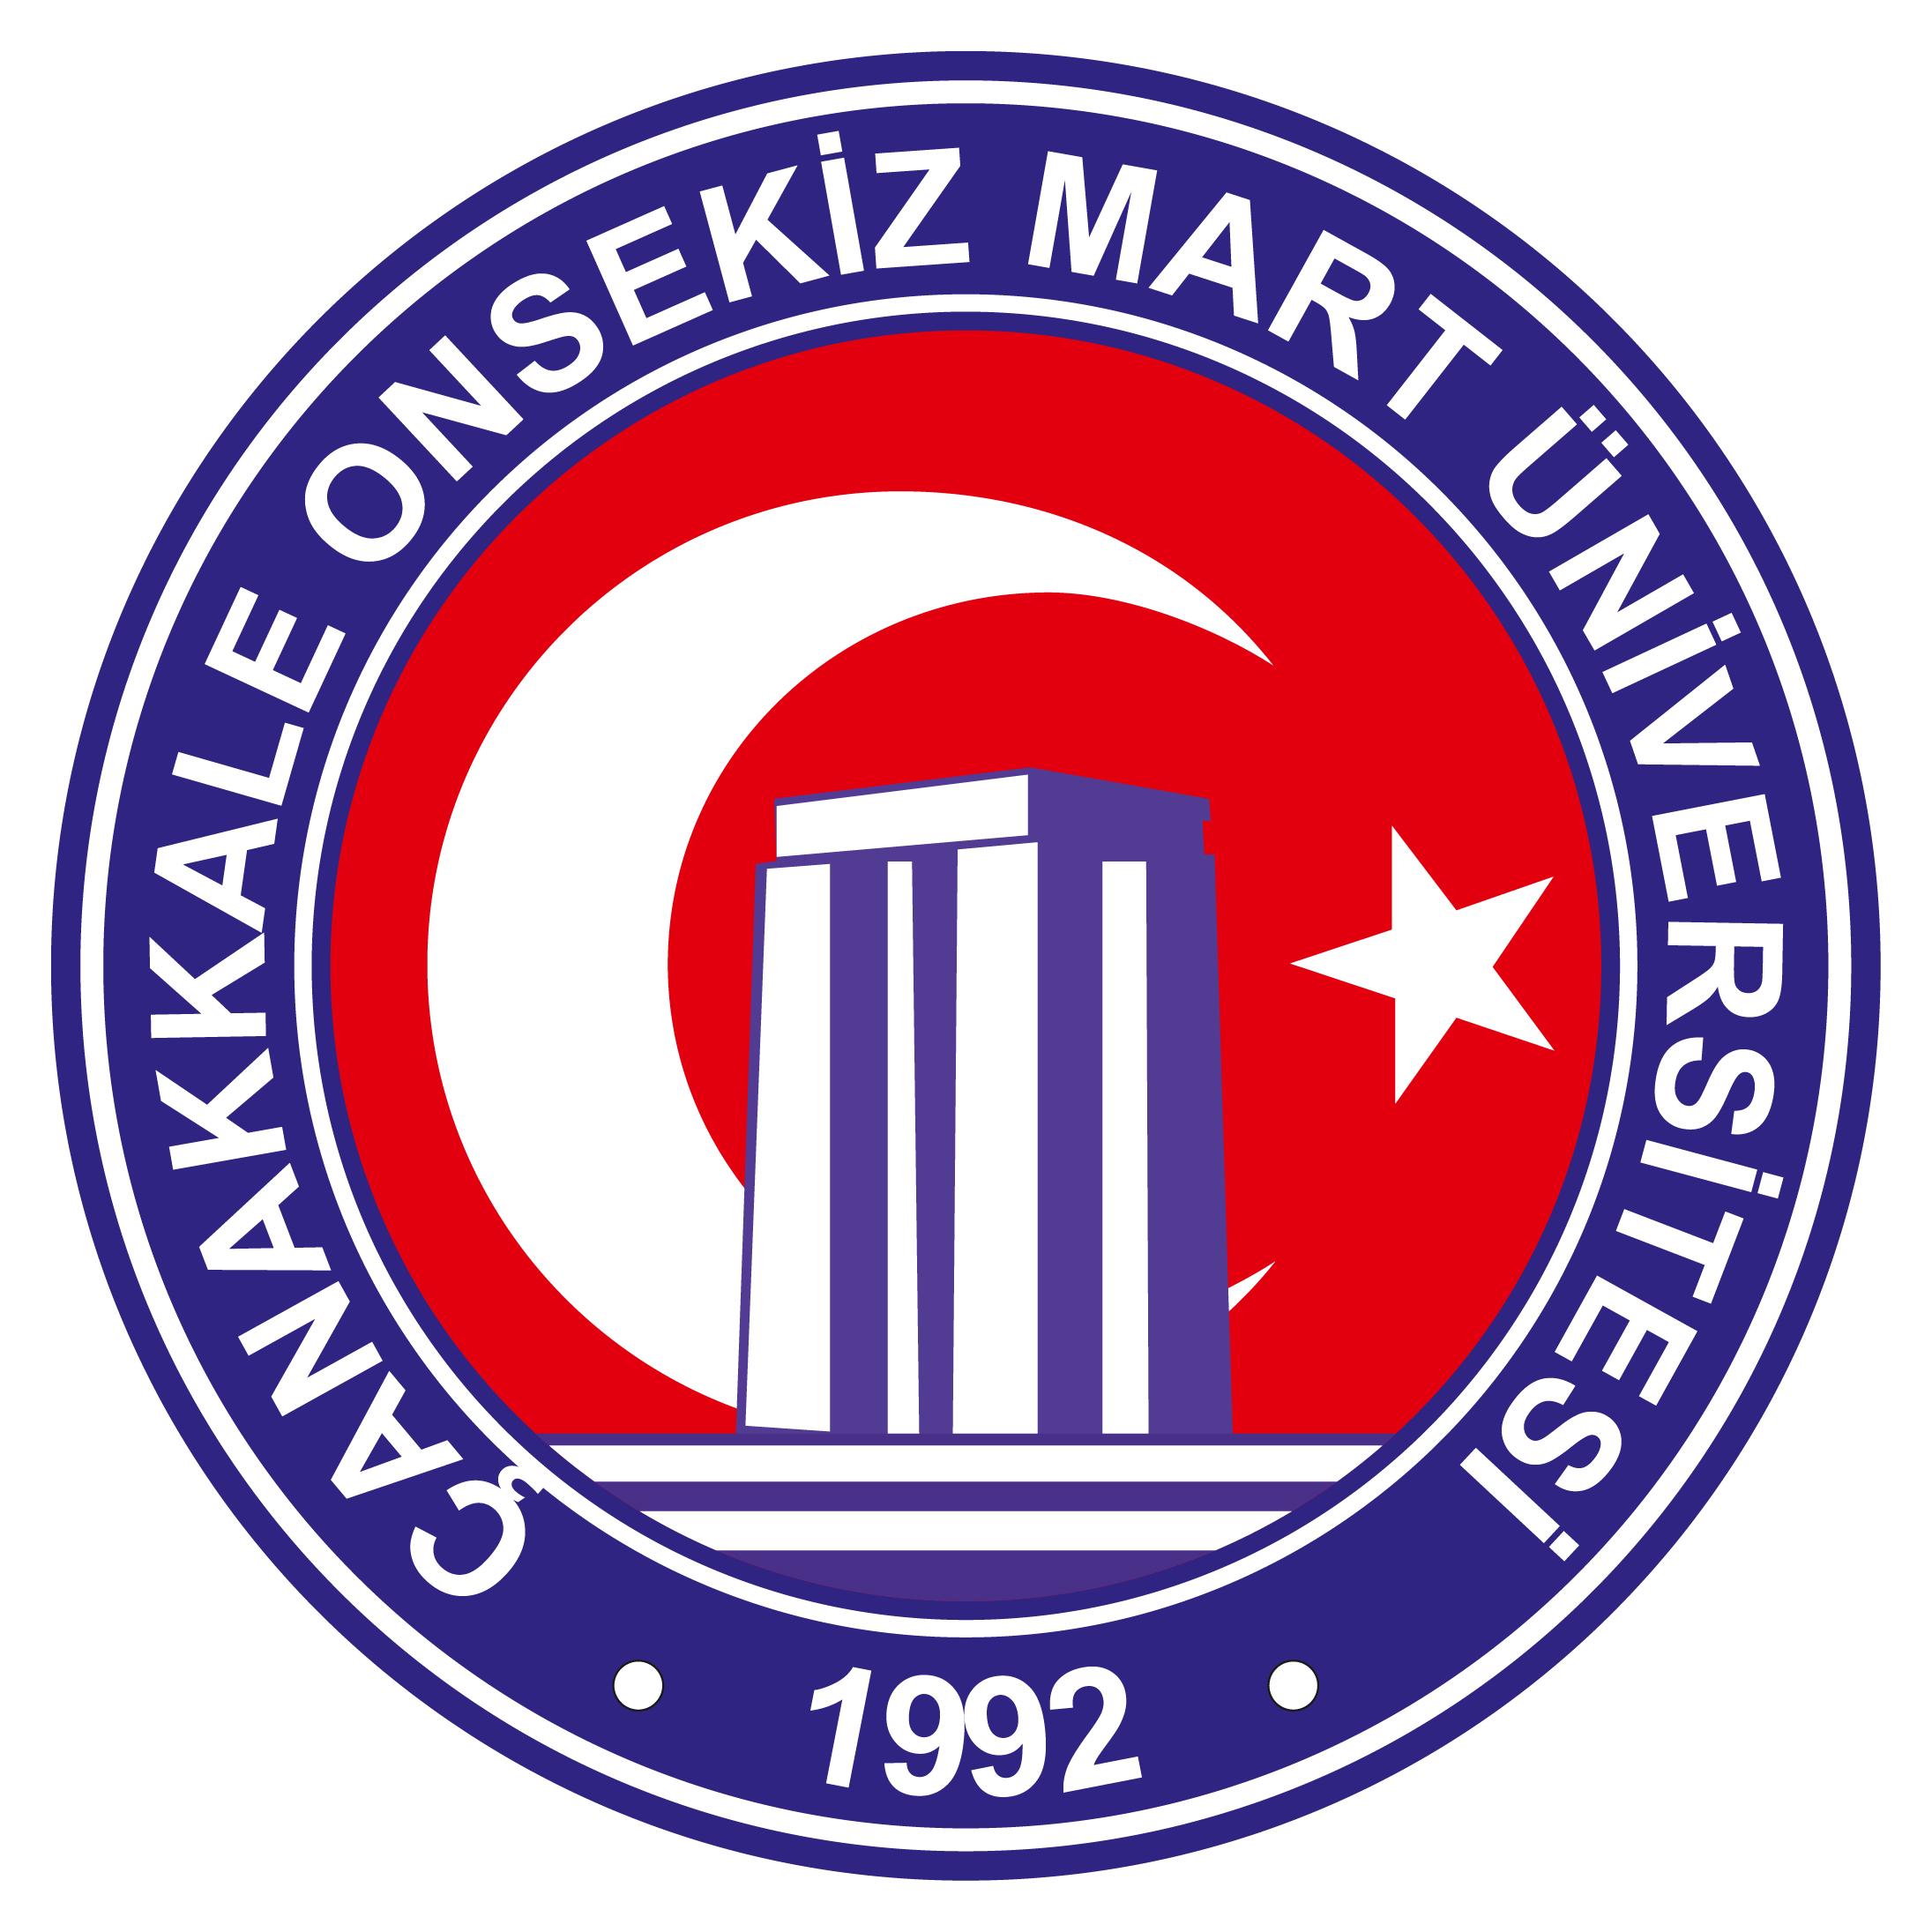 CANAKKALE ONSEKIZ MART UNIVERSITY